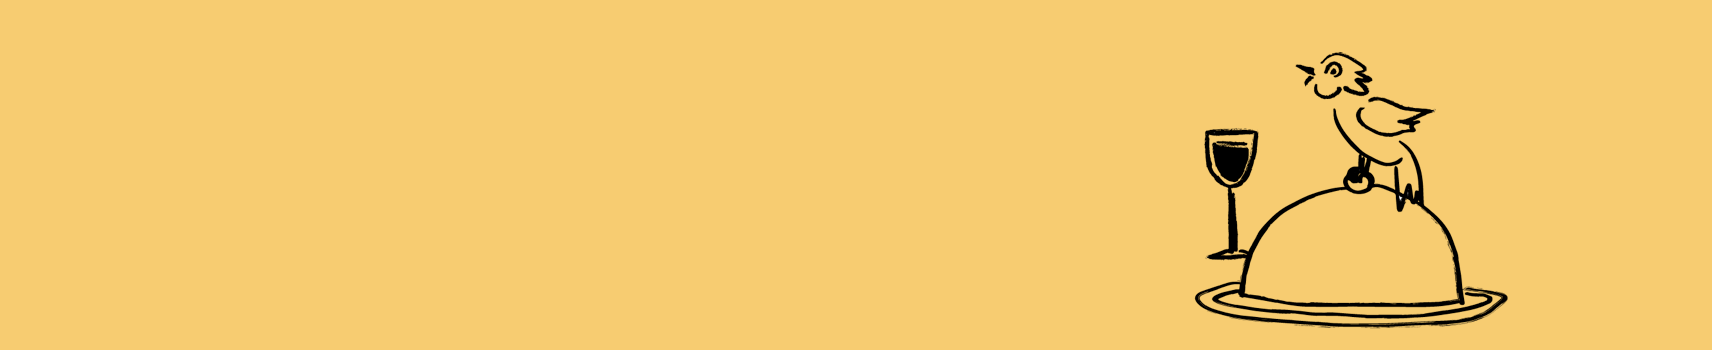 Viandes blanches